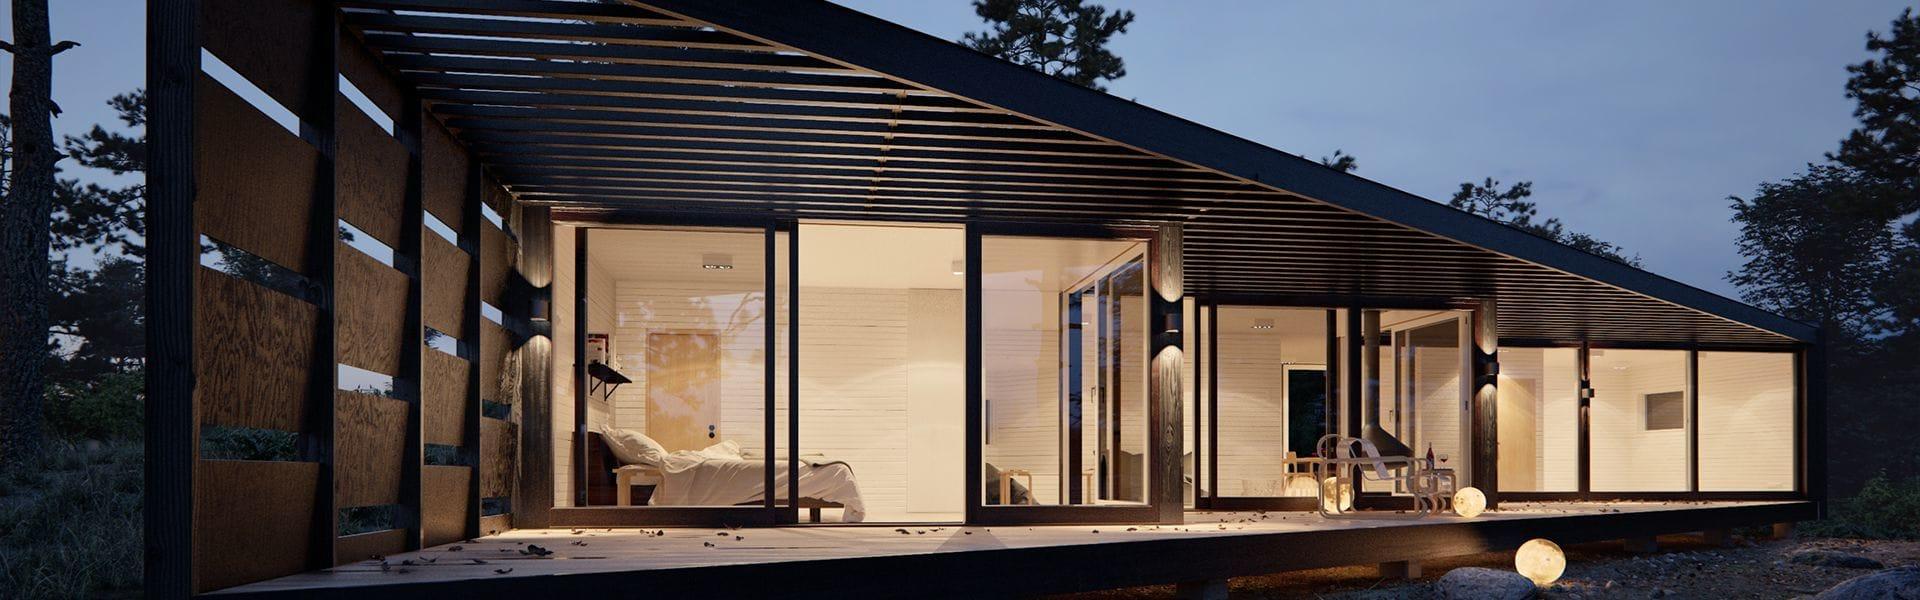 Radek ignaciuk archipelago house vray 3dsmax 600px